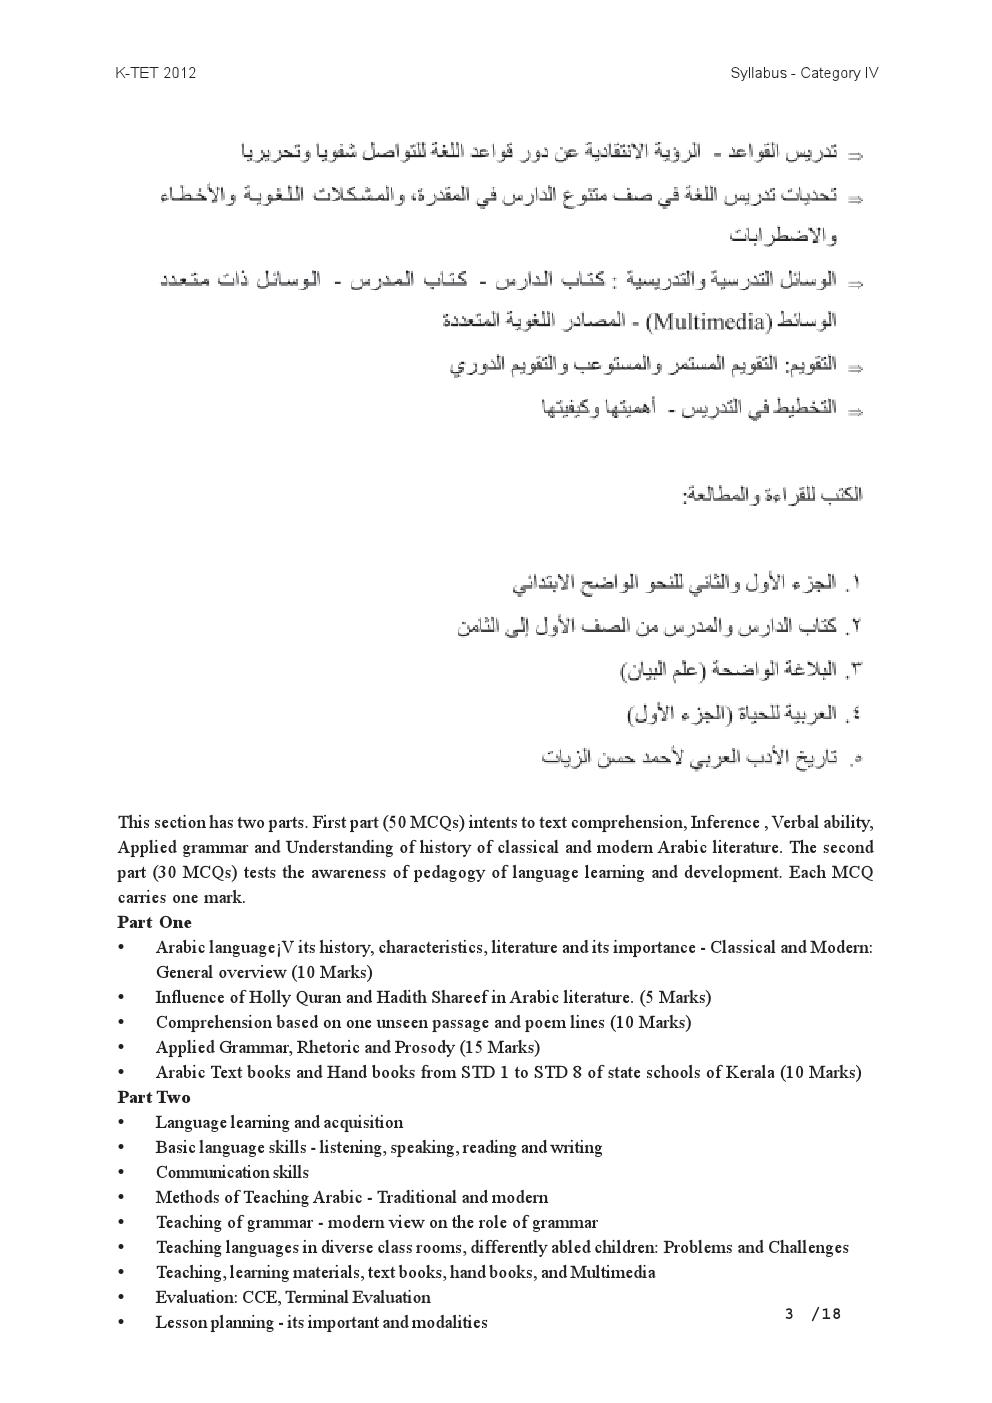 http://masterstudy.net/pdf/syllabus40003.jpg